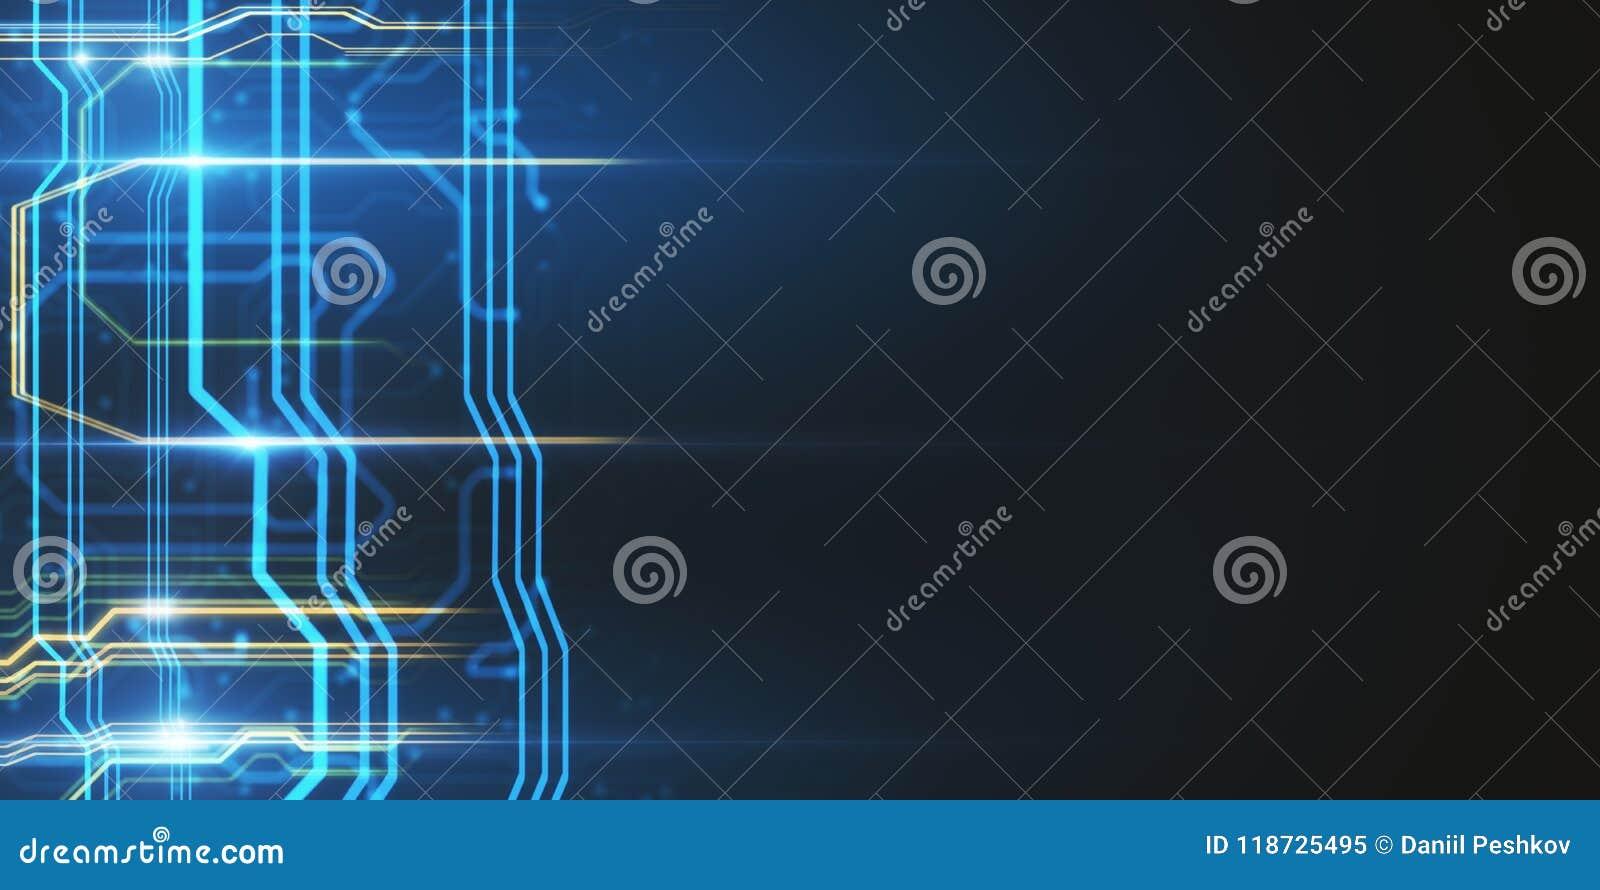 creative circuit wallpaper stock illustration illustration of